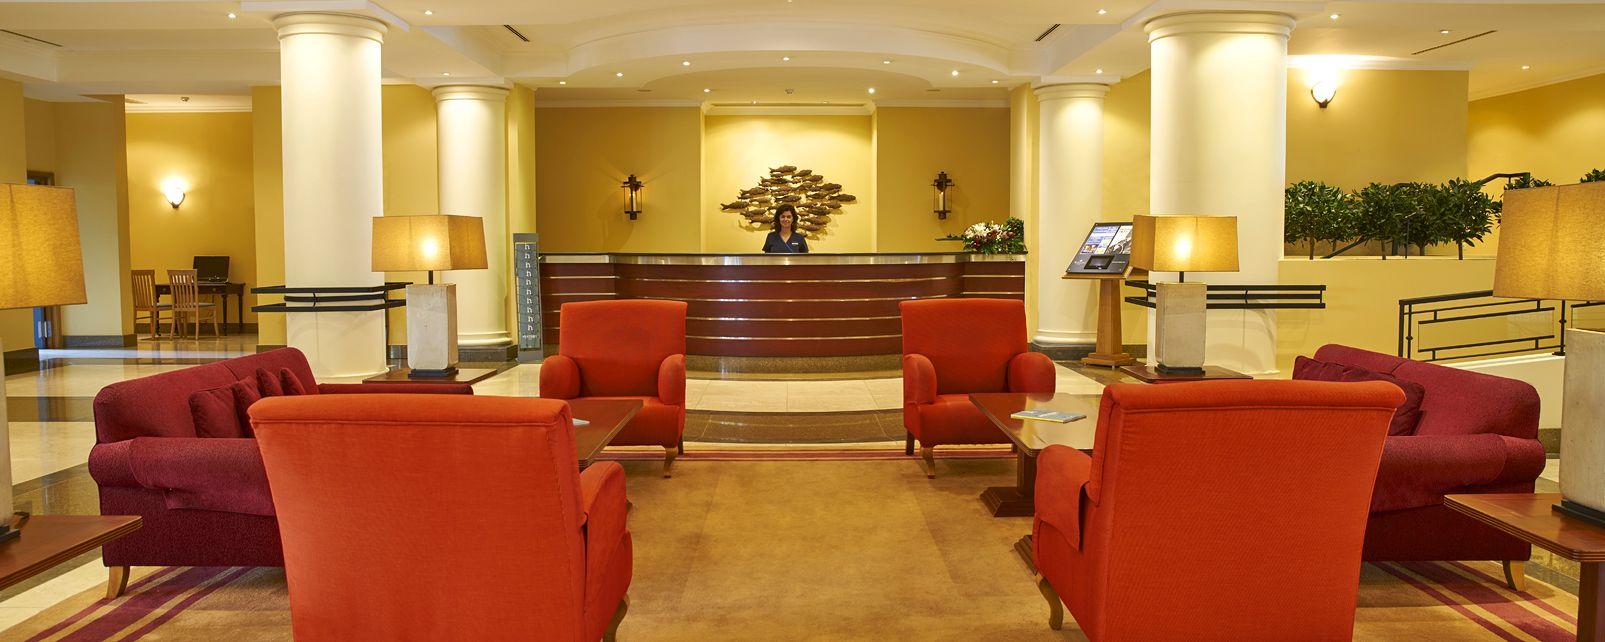 Hotel Porto Santa Maria